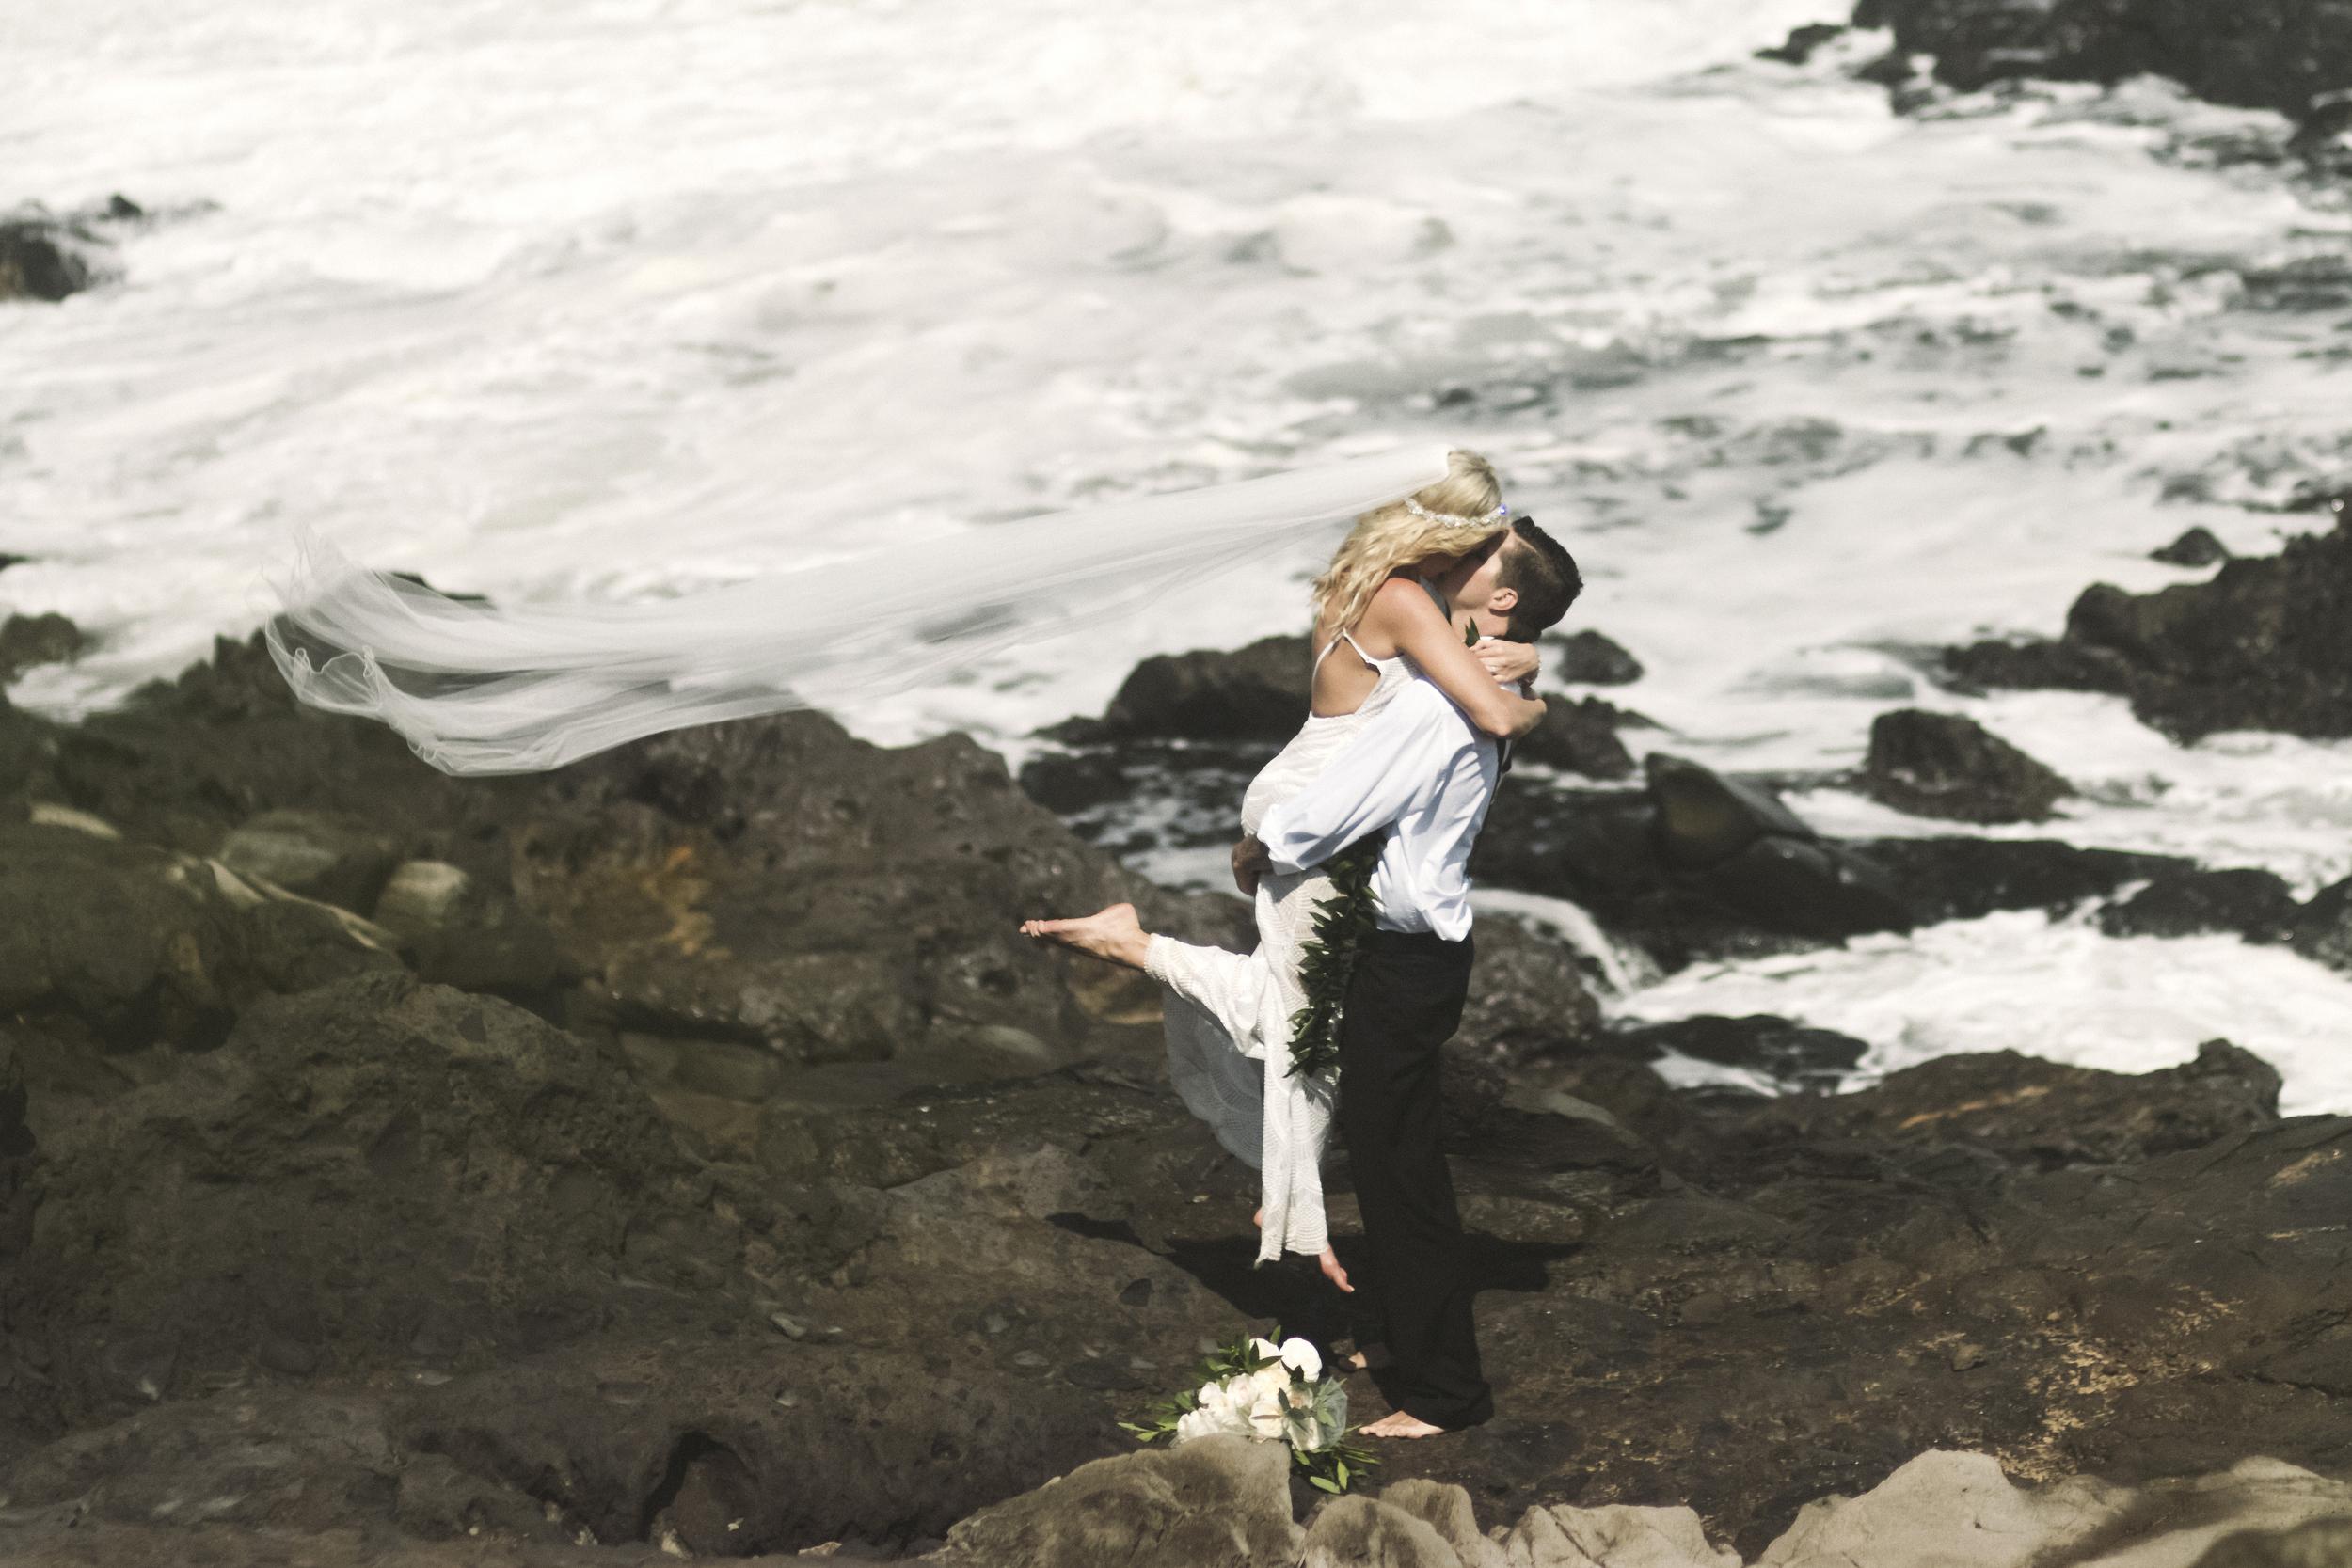 angie-diaz-photography-hawaii-wedding-47.jpg